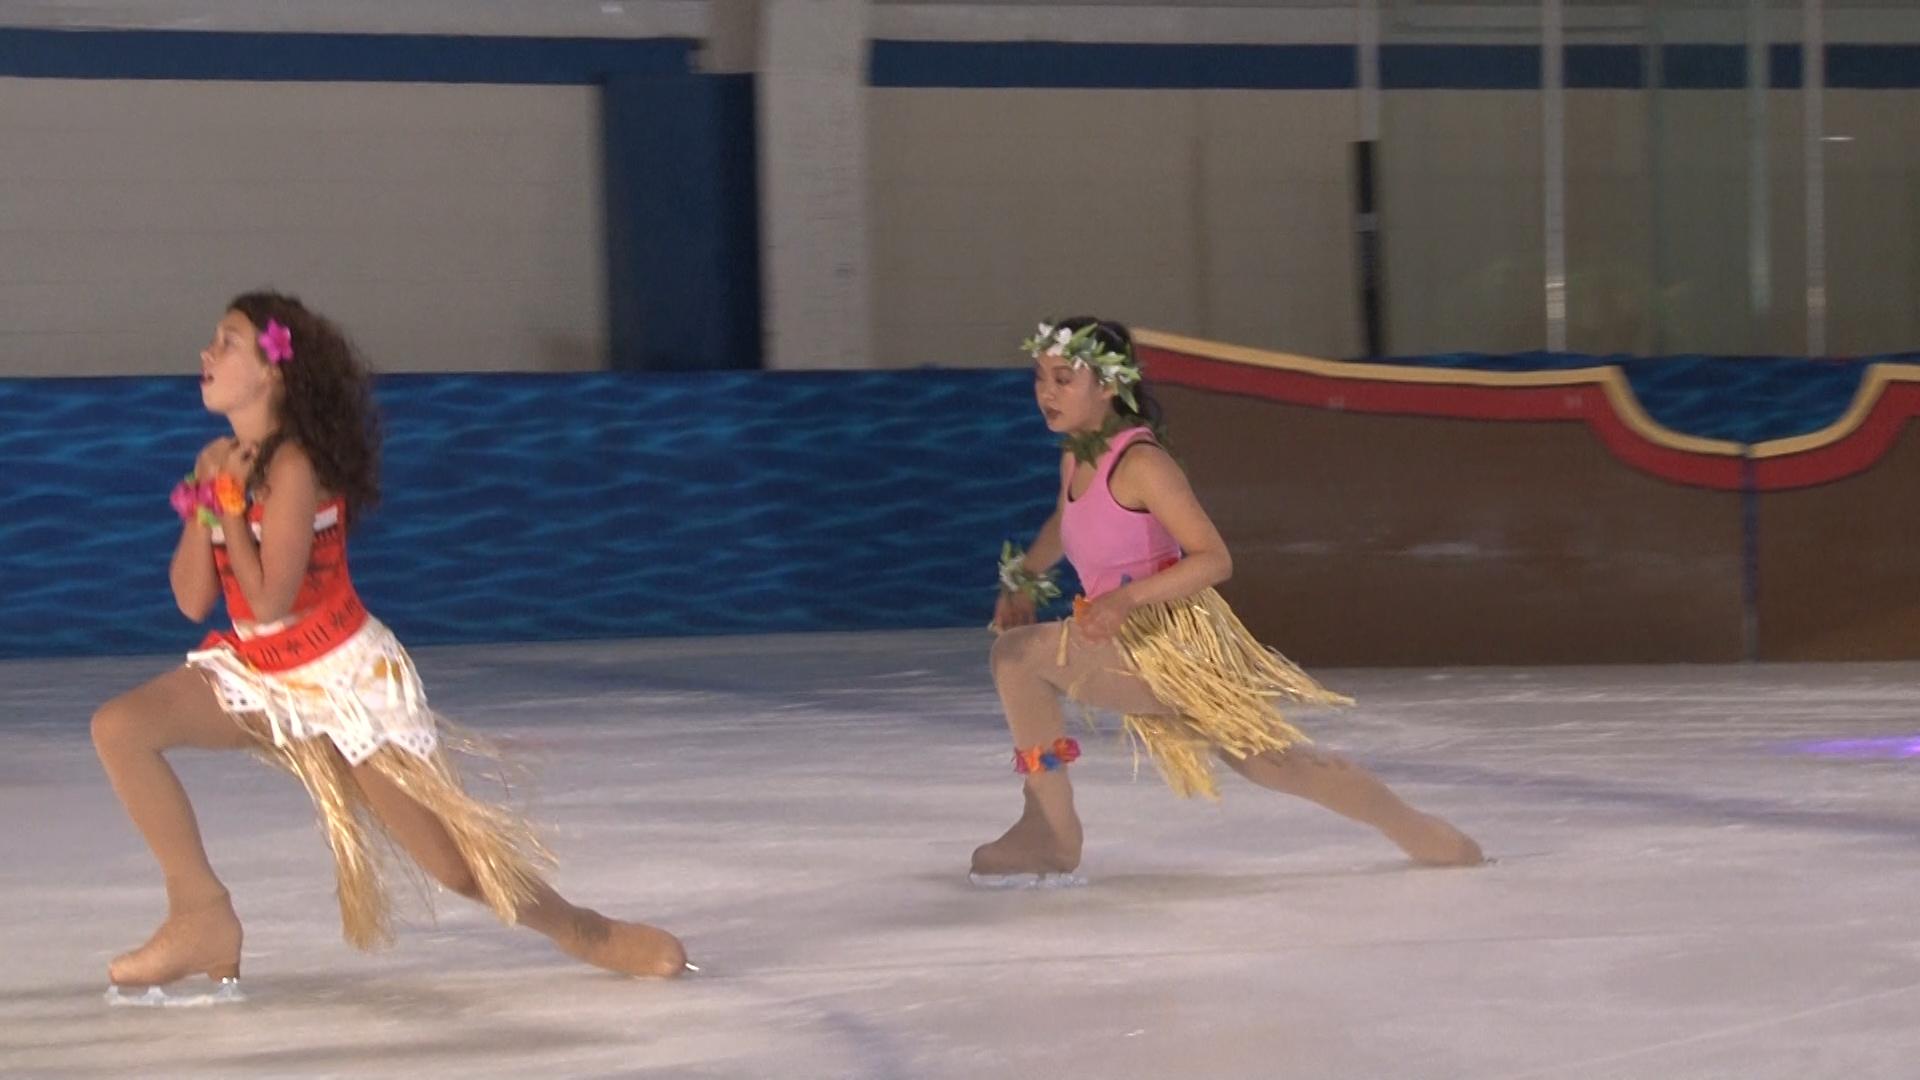 Power Play Maui Skate on Ice 071417.00_16_44_13.Still029.jpg